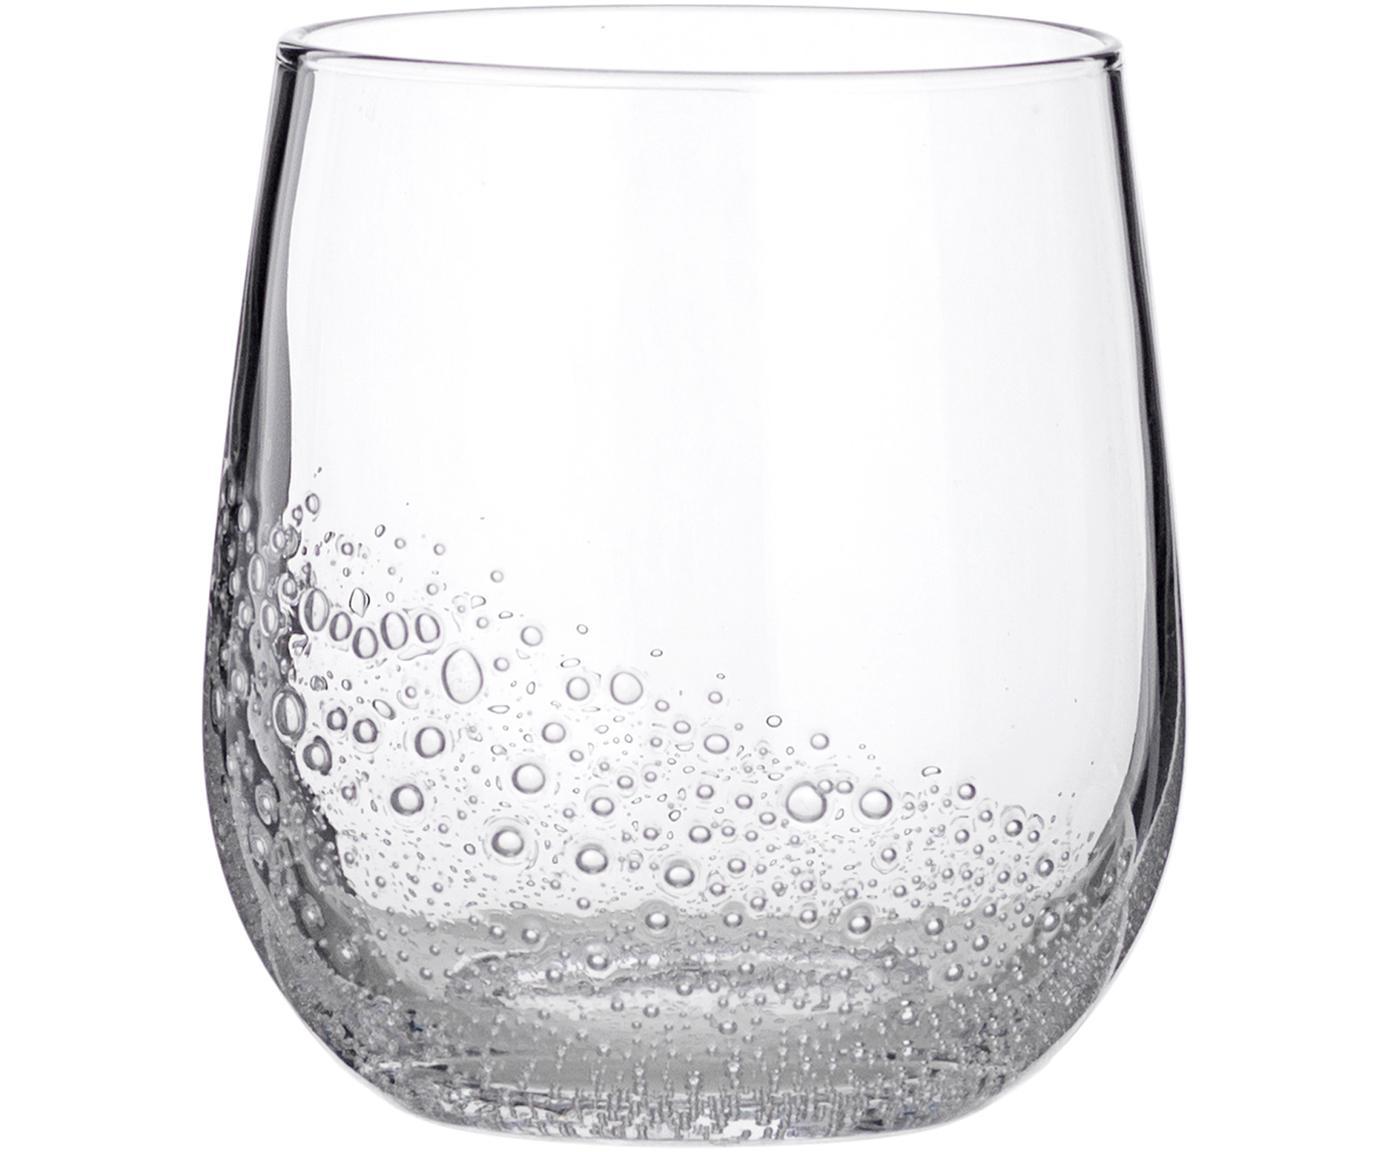 Mondgeblazen waterglazen Bubble, 4 stuks, Mondgeblazen glas, Transparant met luchtbellen, Ø 9 x H 10 cm